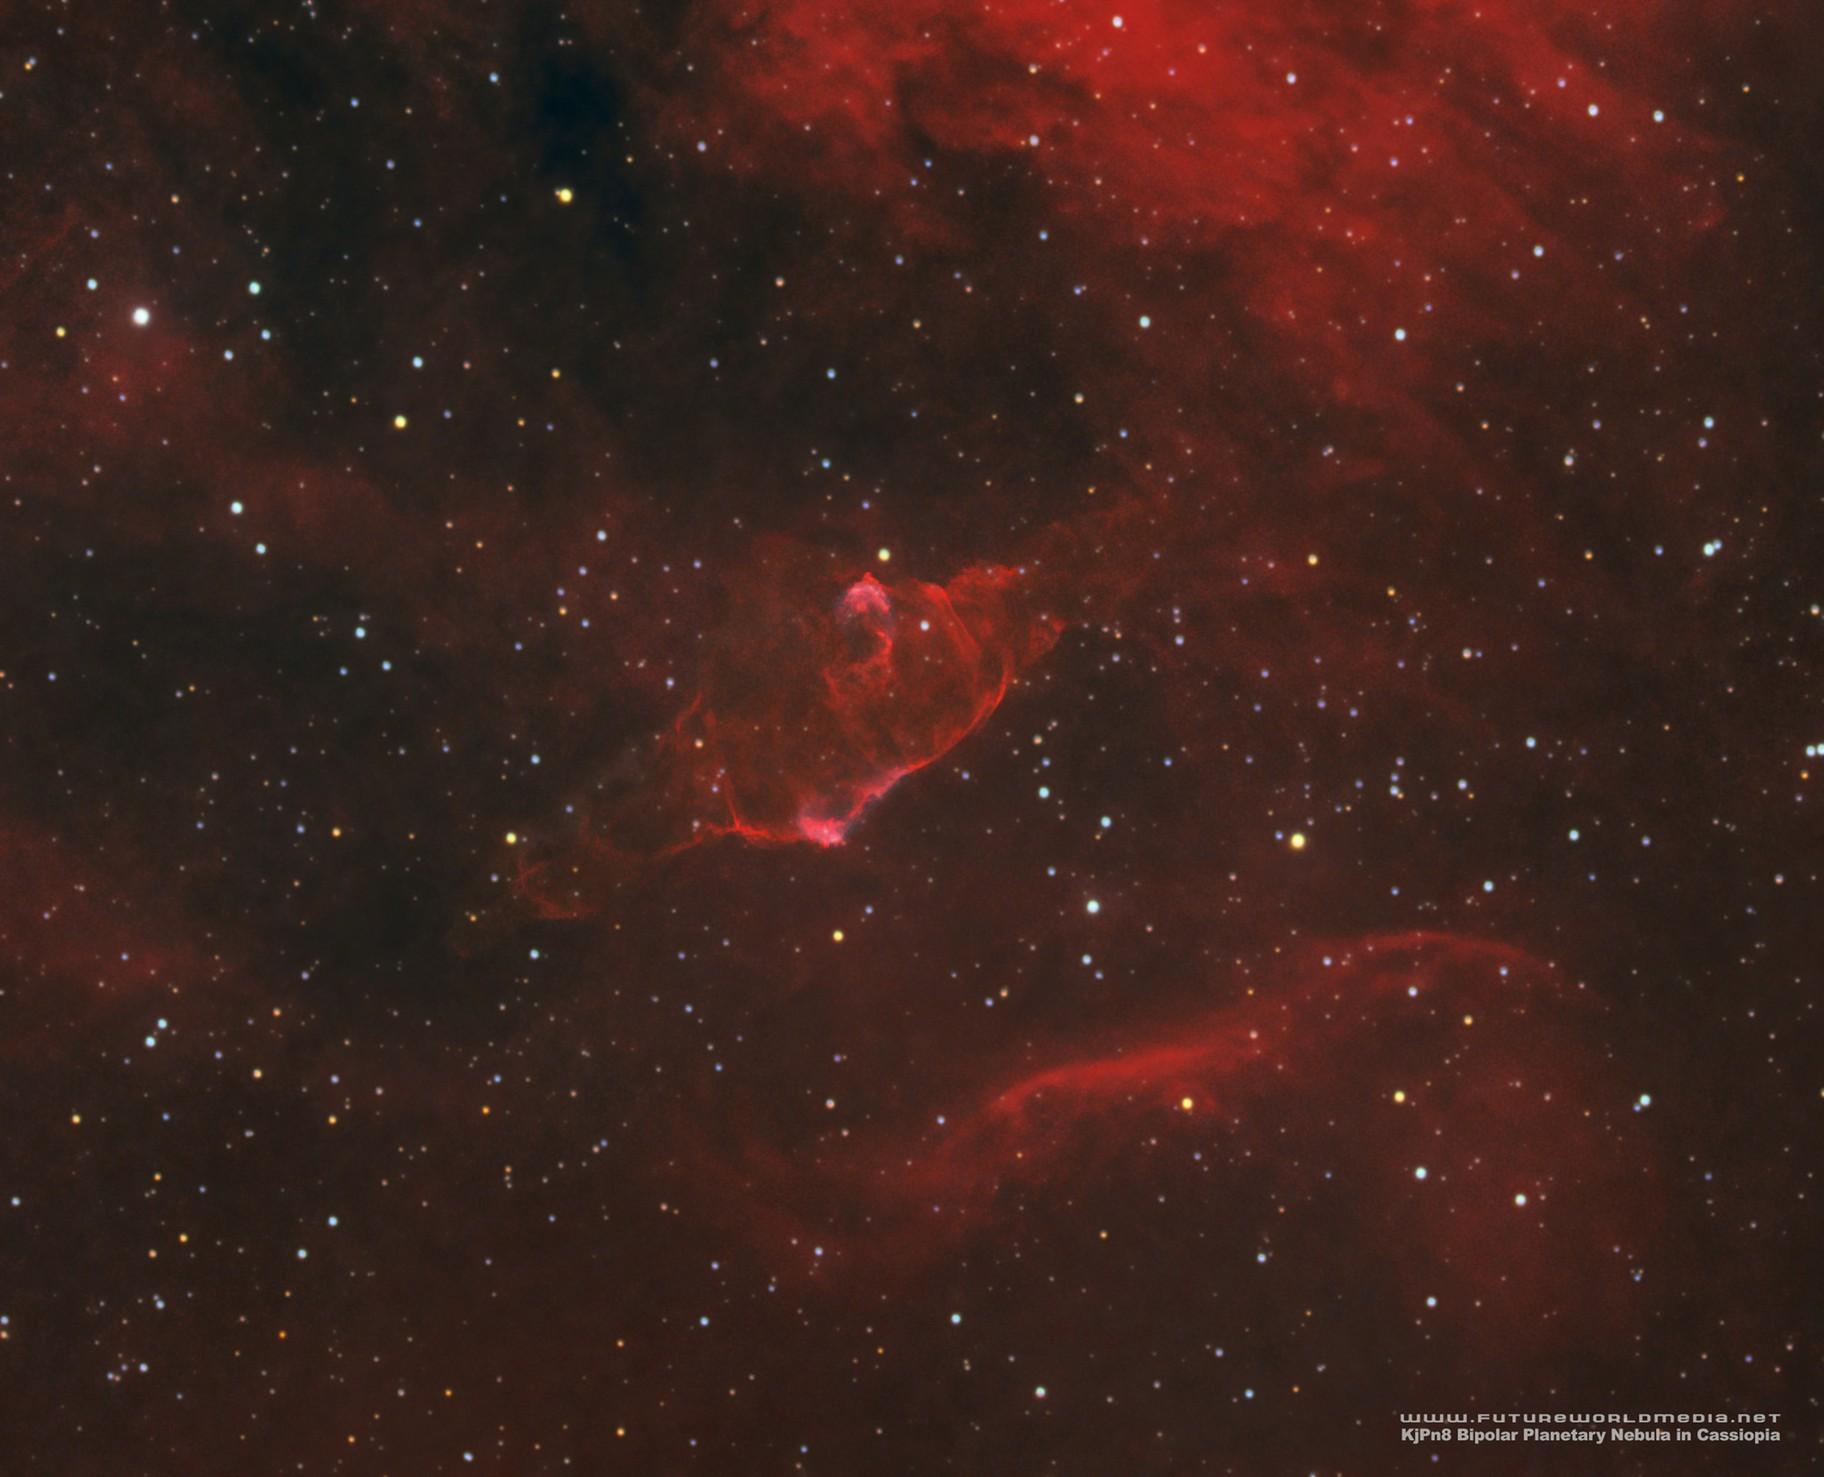 KjPn8 Bipolar Planetary Nebula (PN G112.5-00.1)